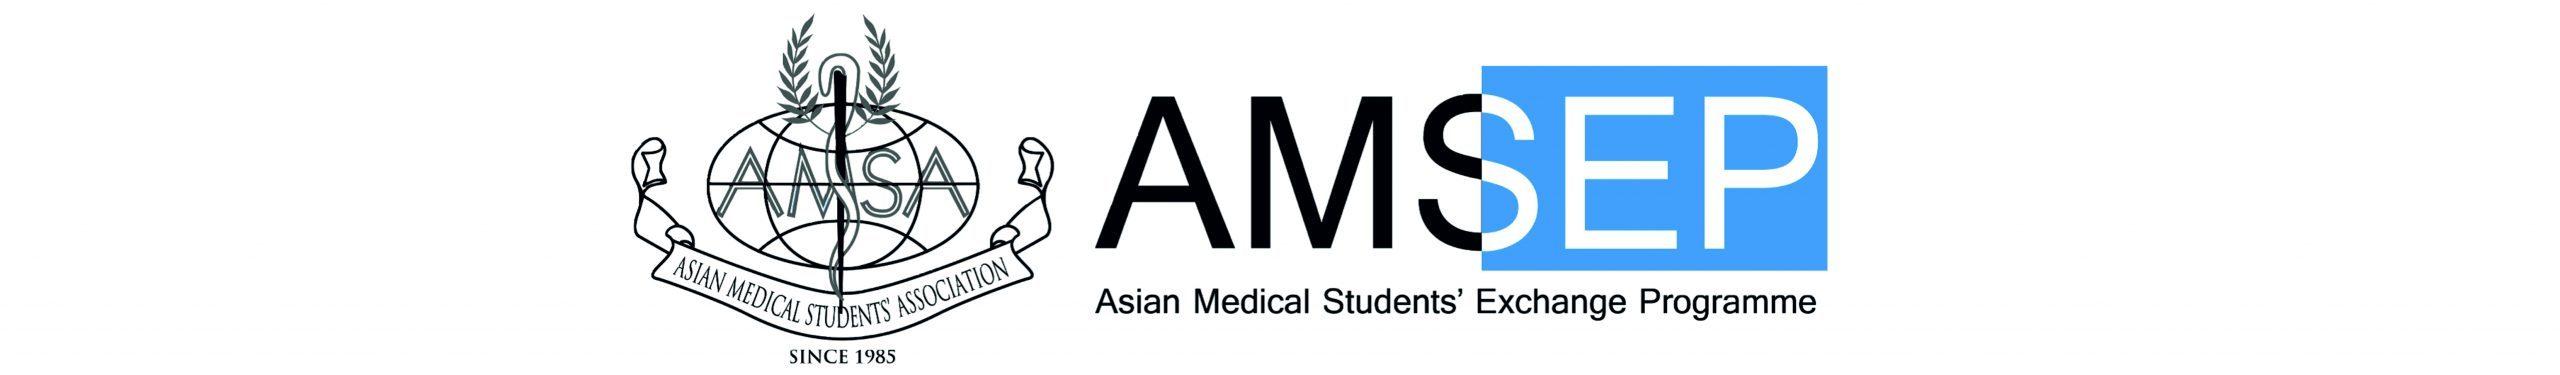 AMSEP INTERNATIONAL